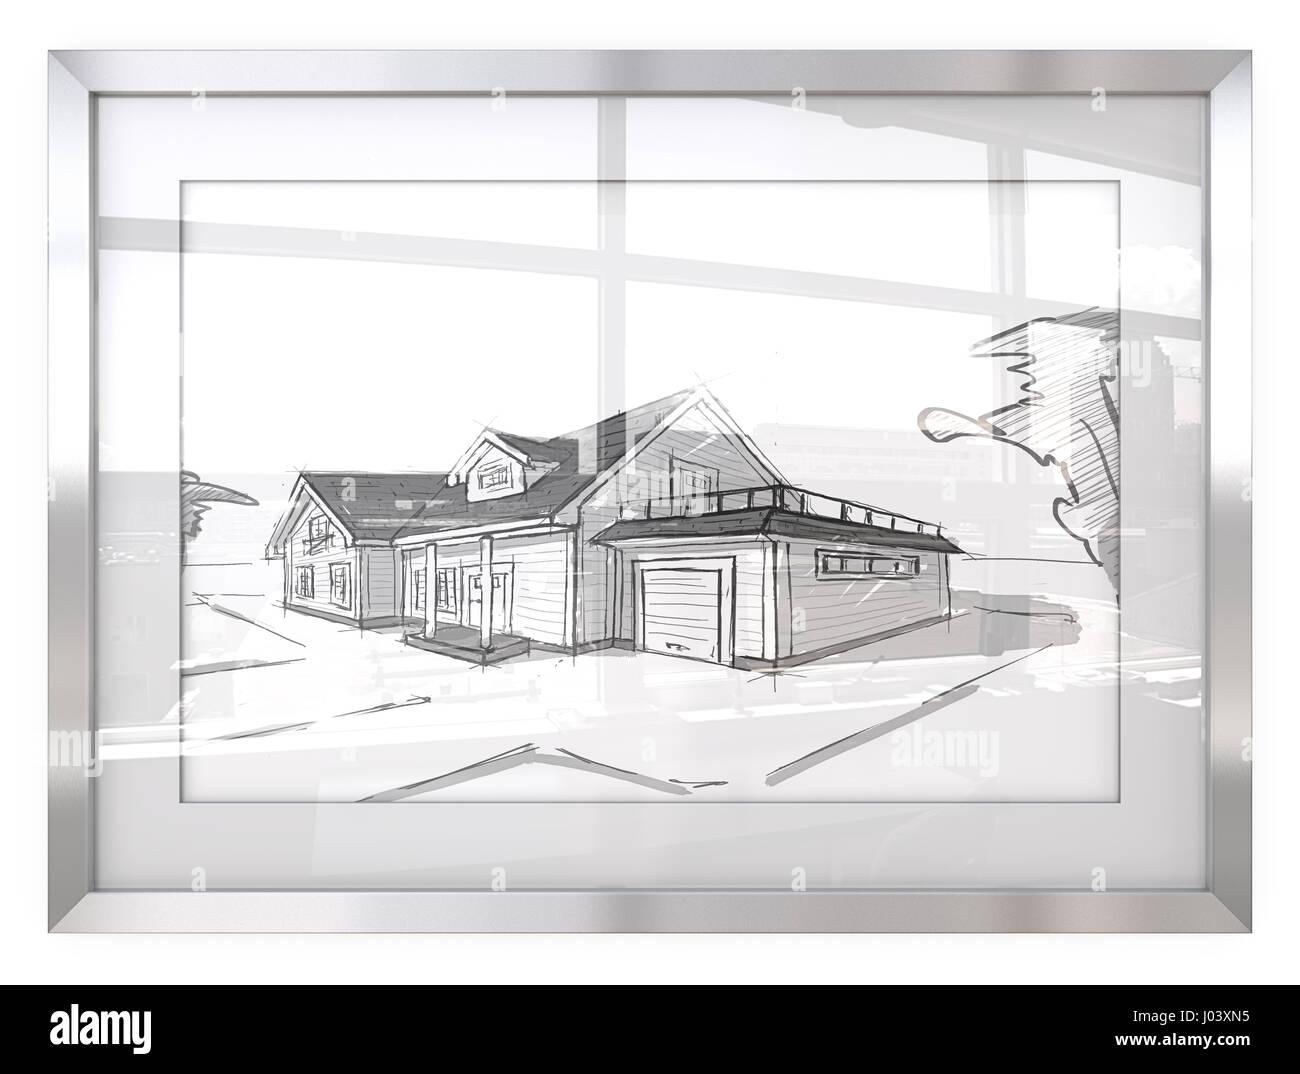 architectural buildings sketches. Unique Buildings Picture Frame With Architectural House SketchesGeneric Building  Reflective Glass Cityscape View 3D Render To Buildings Sketches T